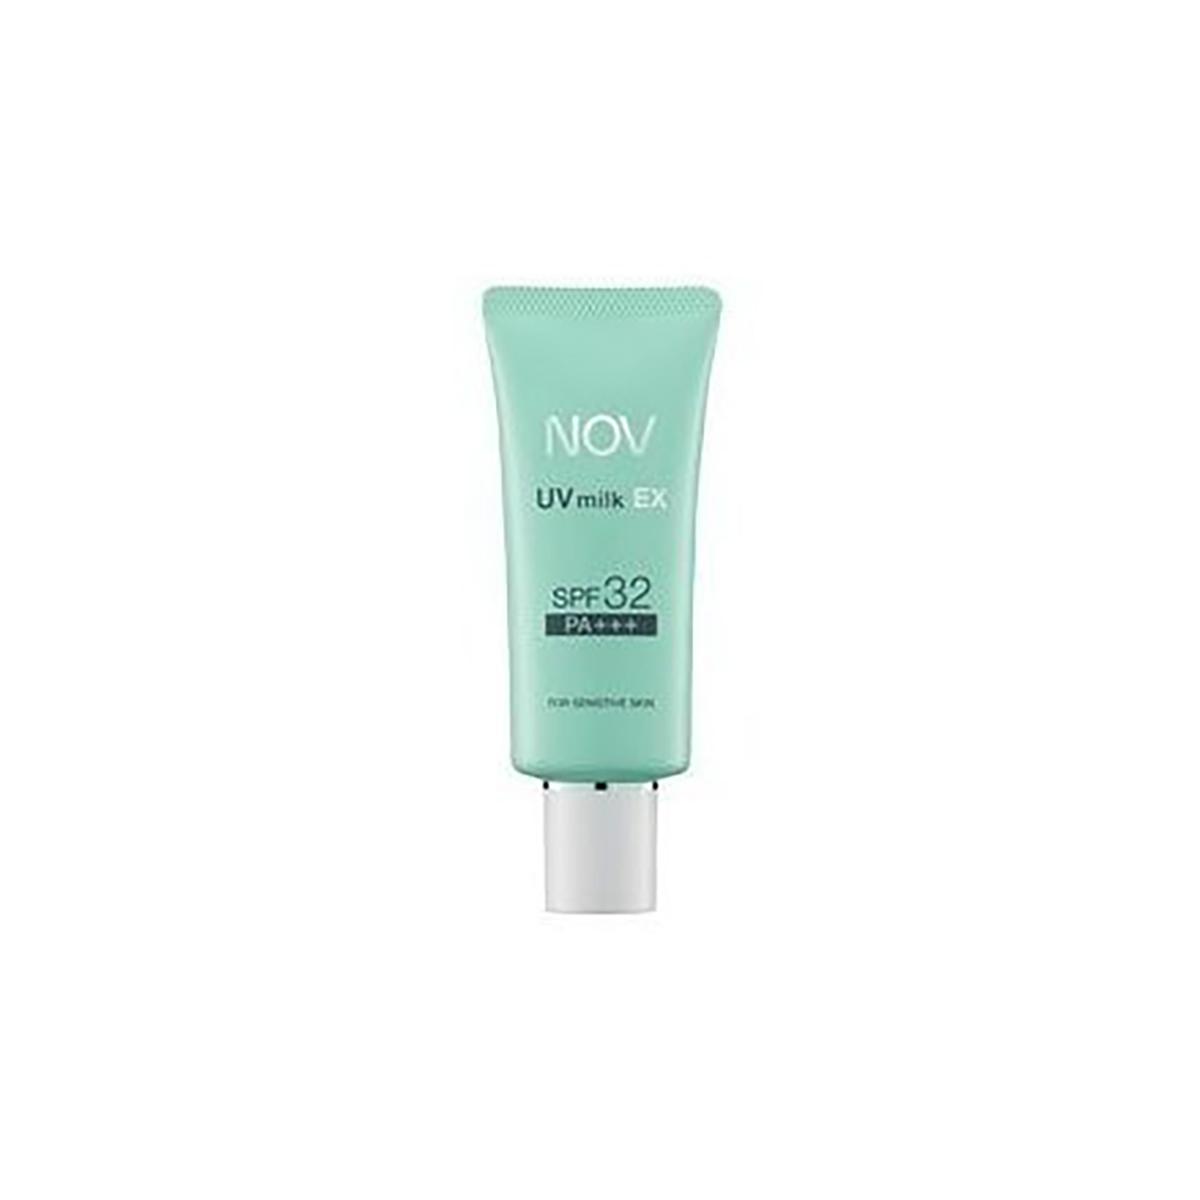 Buy NOV UV Milk Ex SPF 32 Pa+++, For Sensitive Skin Sunscreen 35g  [Ship from SG / 100% Authentic] Singapore